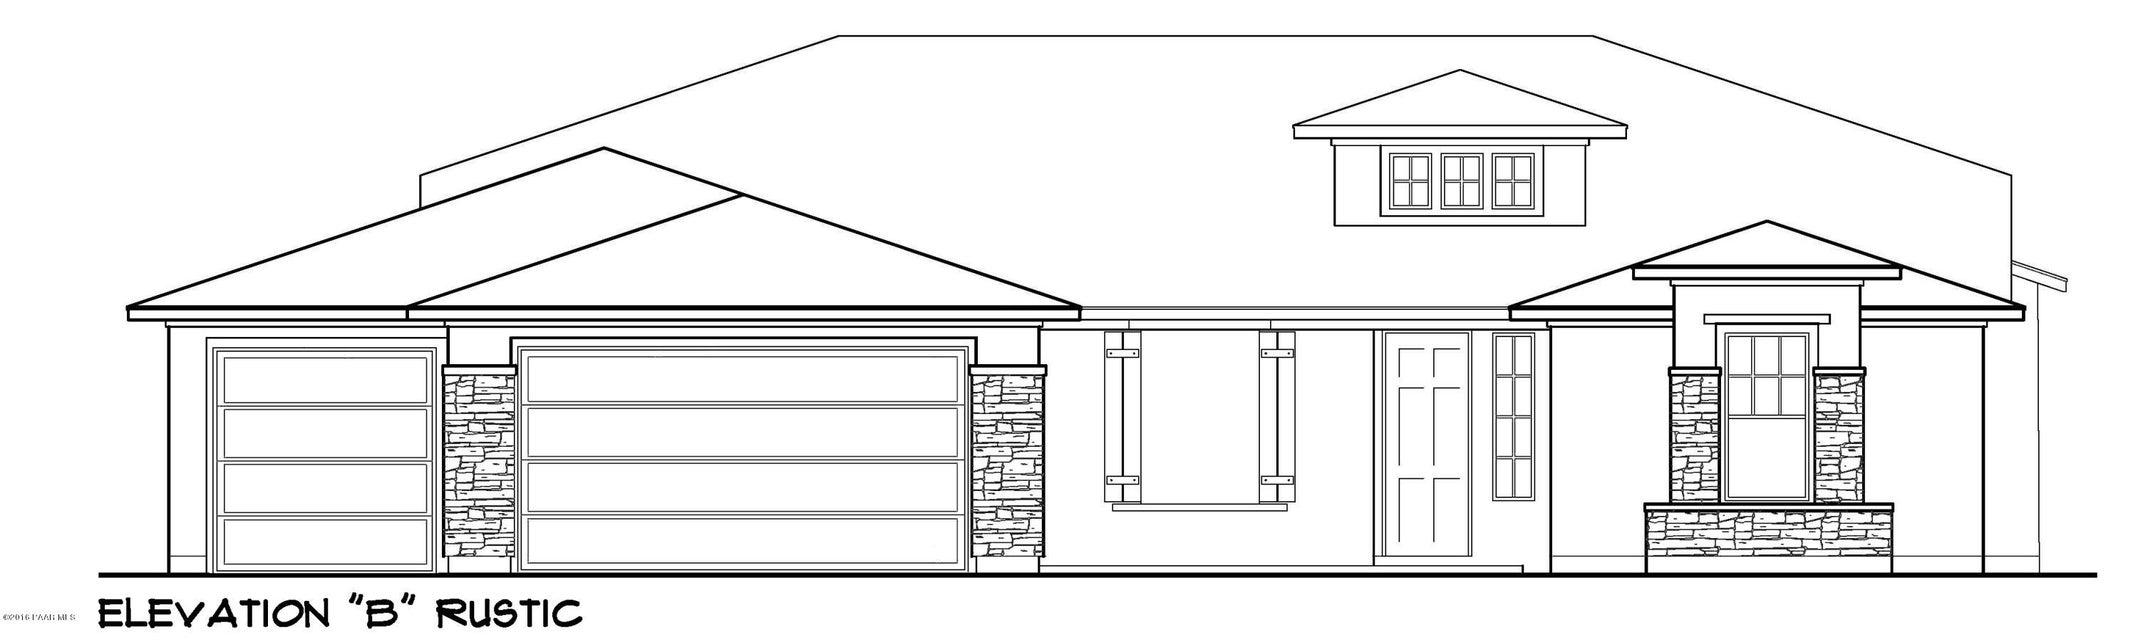 7290 E Sienna Springs Lane, Prescott Valley Az 86314